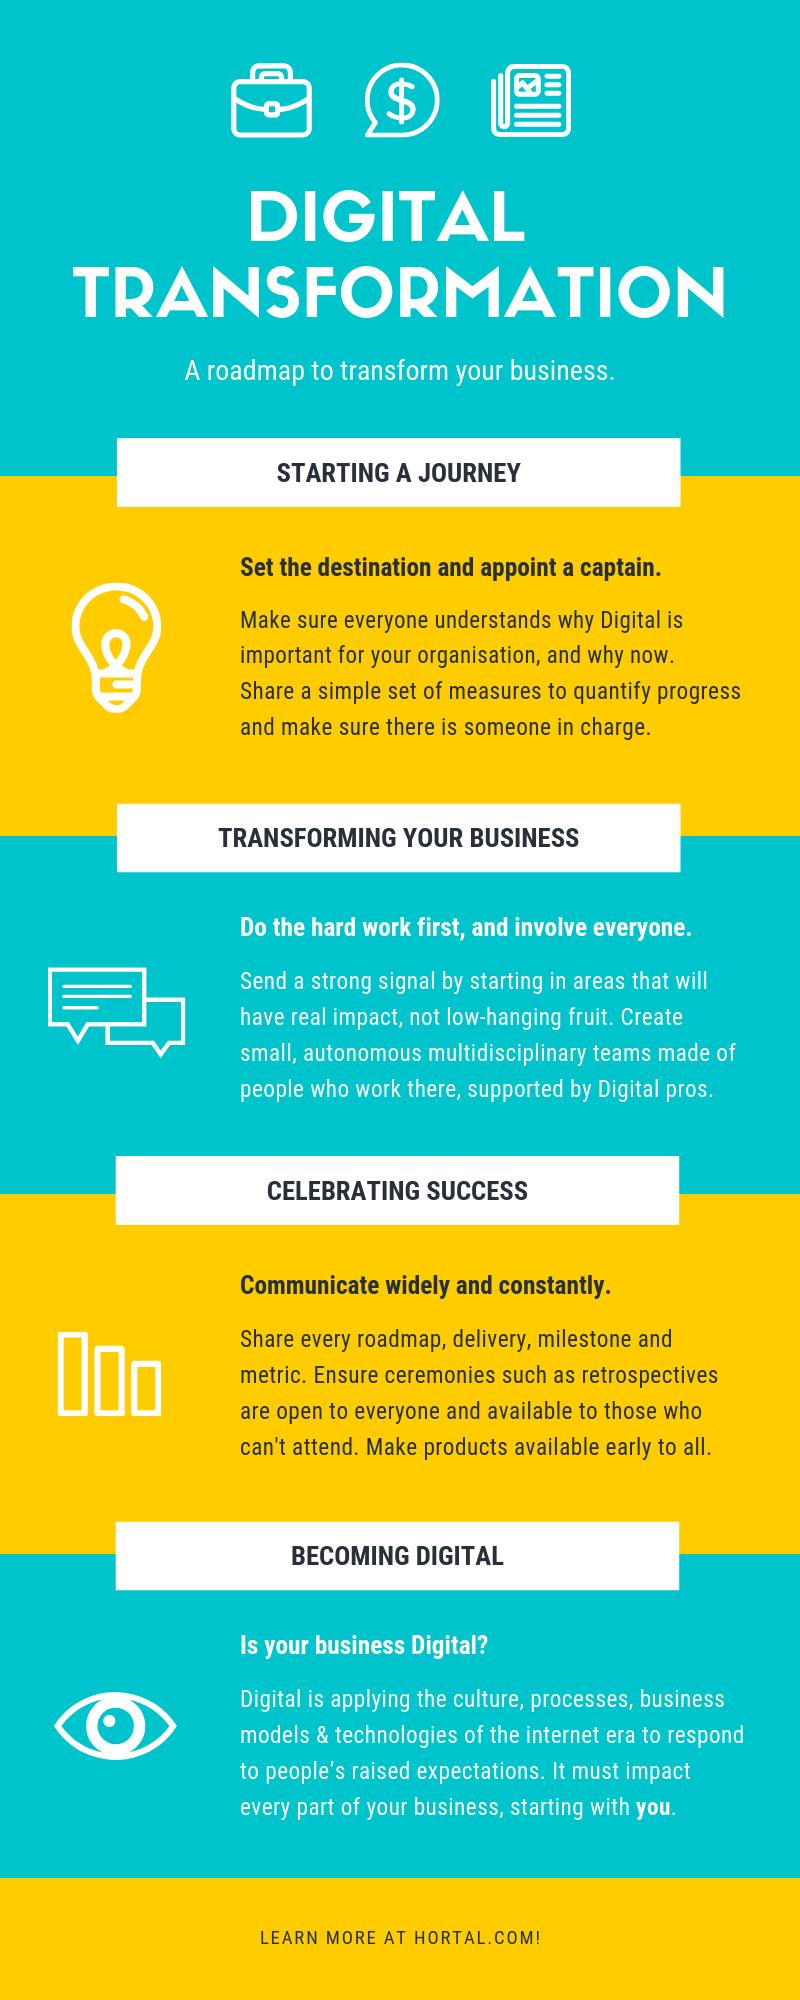 Hortal.com Digital Transformation Infographic